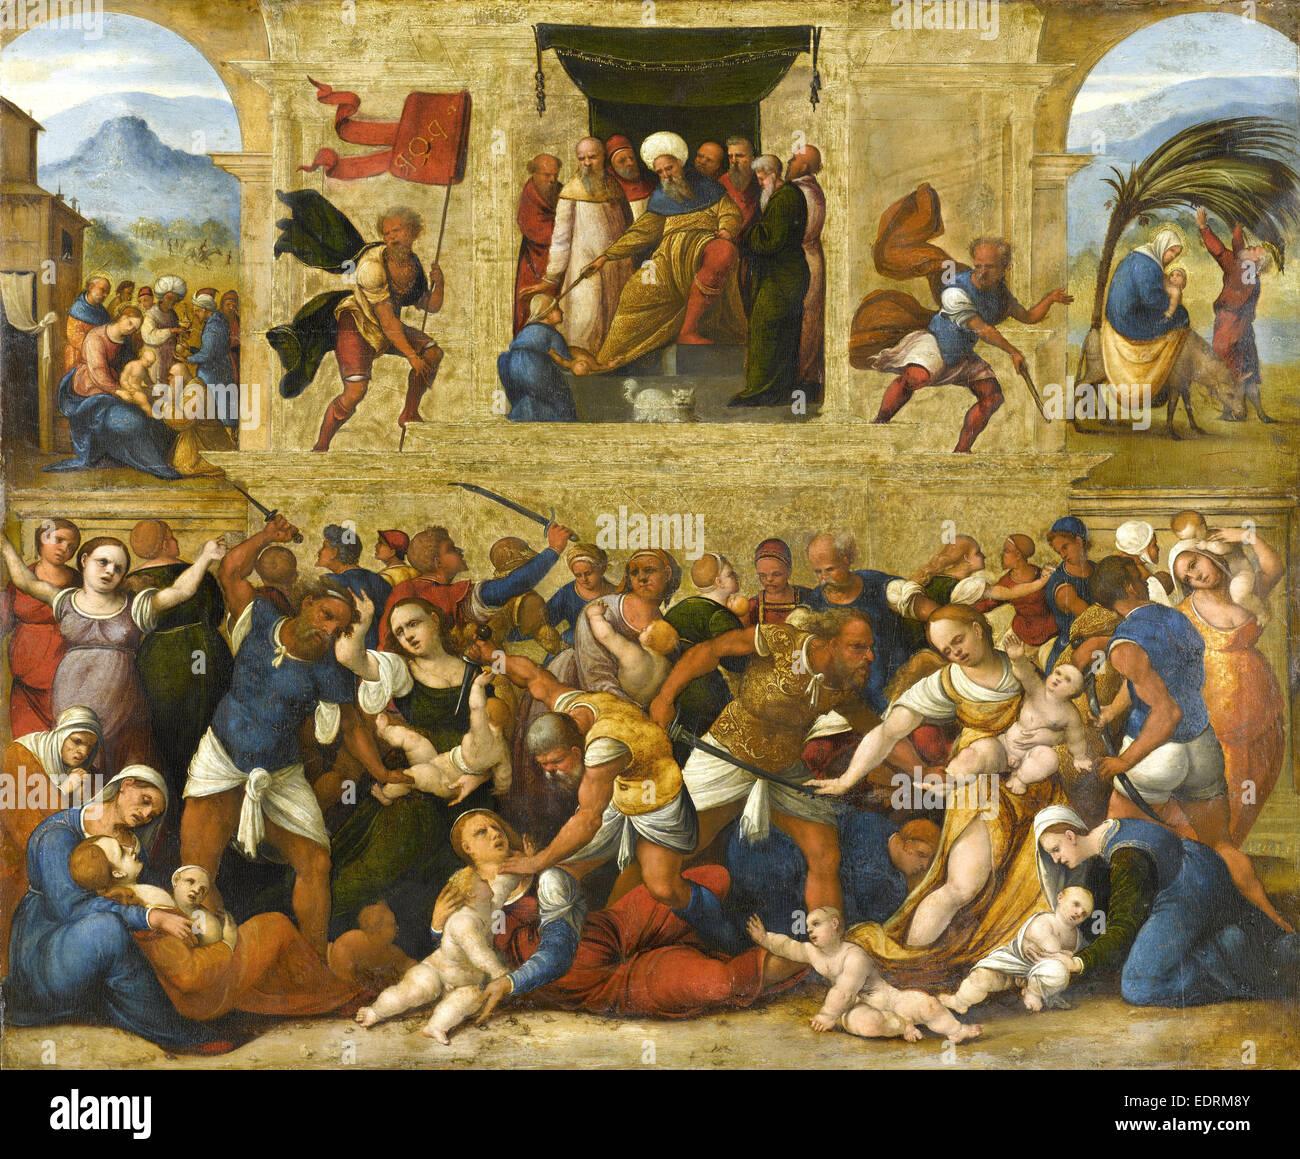 Massacre of the Innocents, Lodovico Mazzolino, 1510 - 1530 Stock Photo